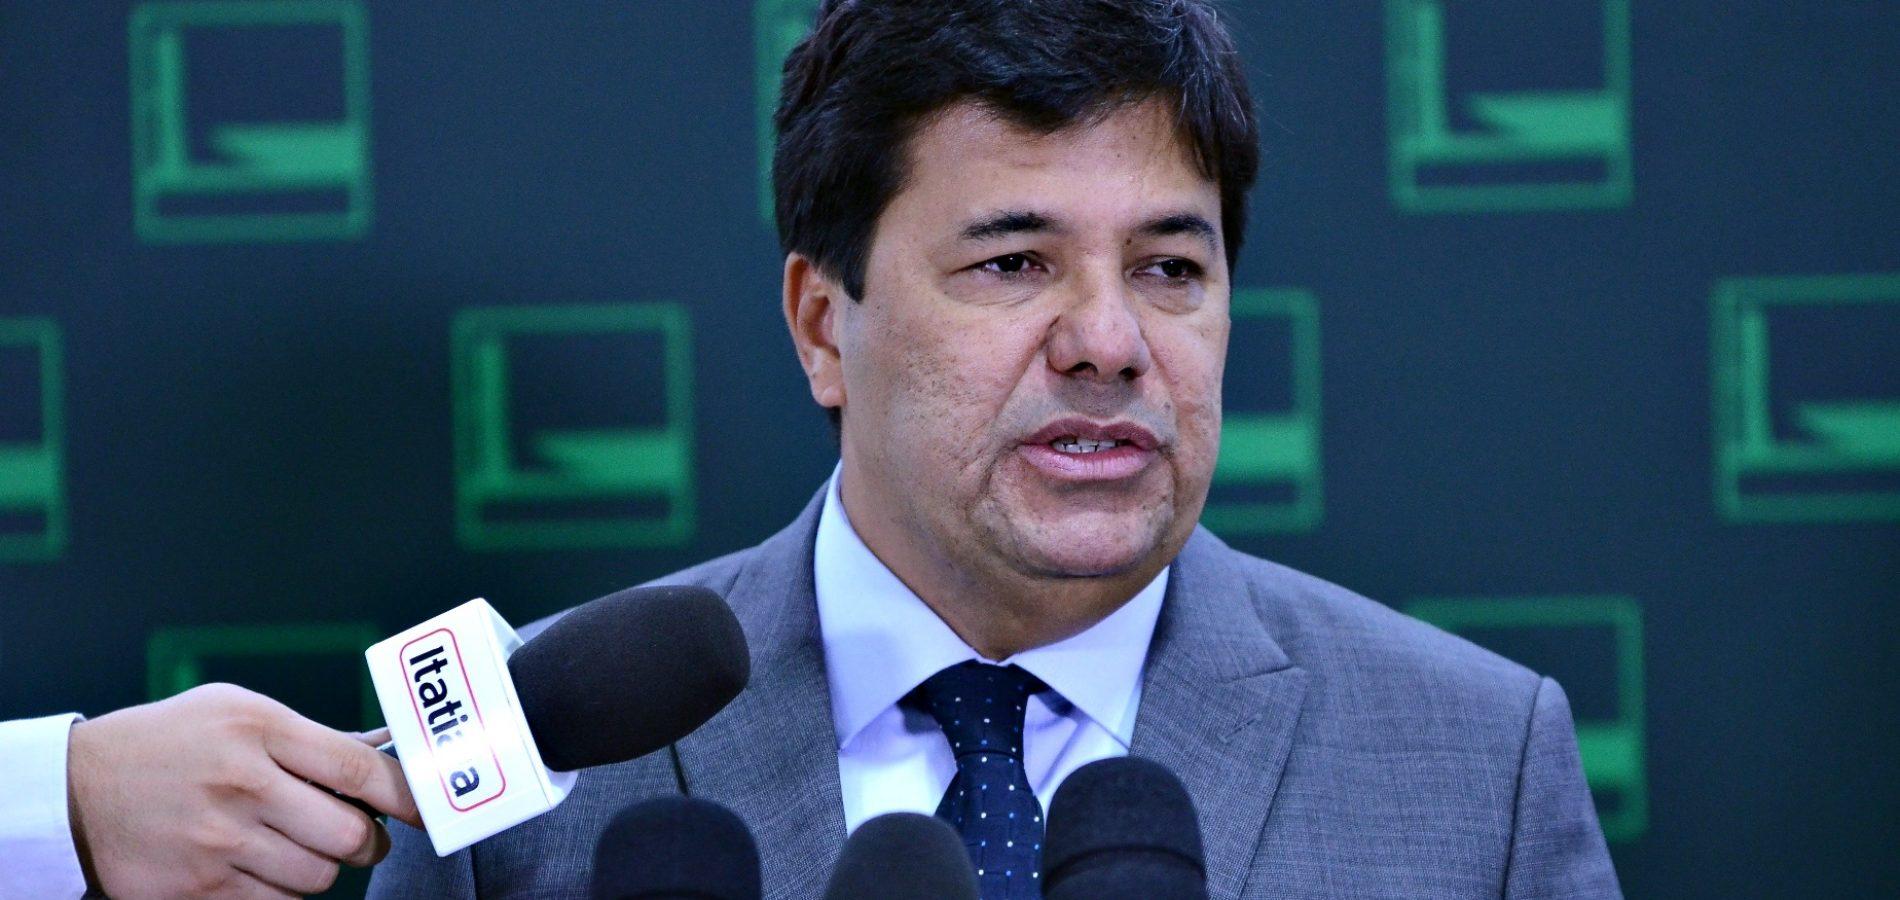 Governo Michel Temer suspende novas vagas para Pronatec, ProUni e Fies